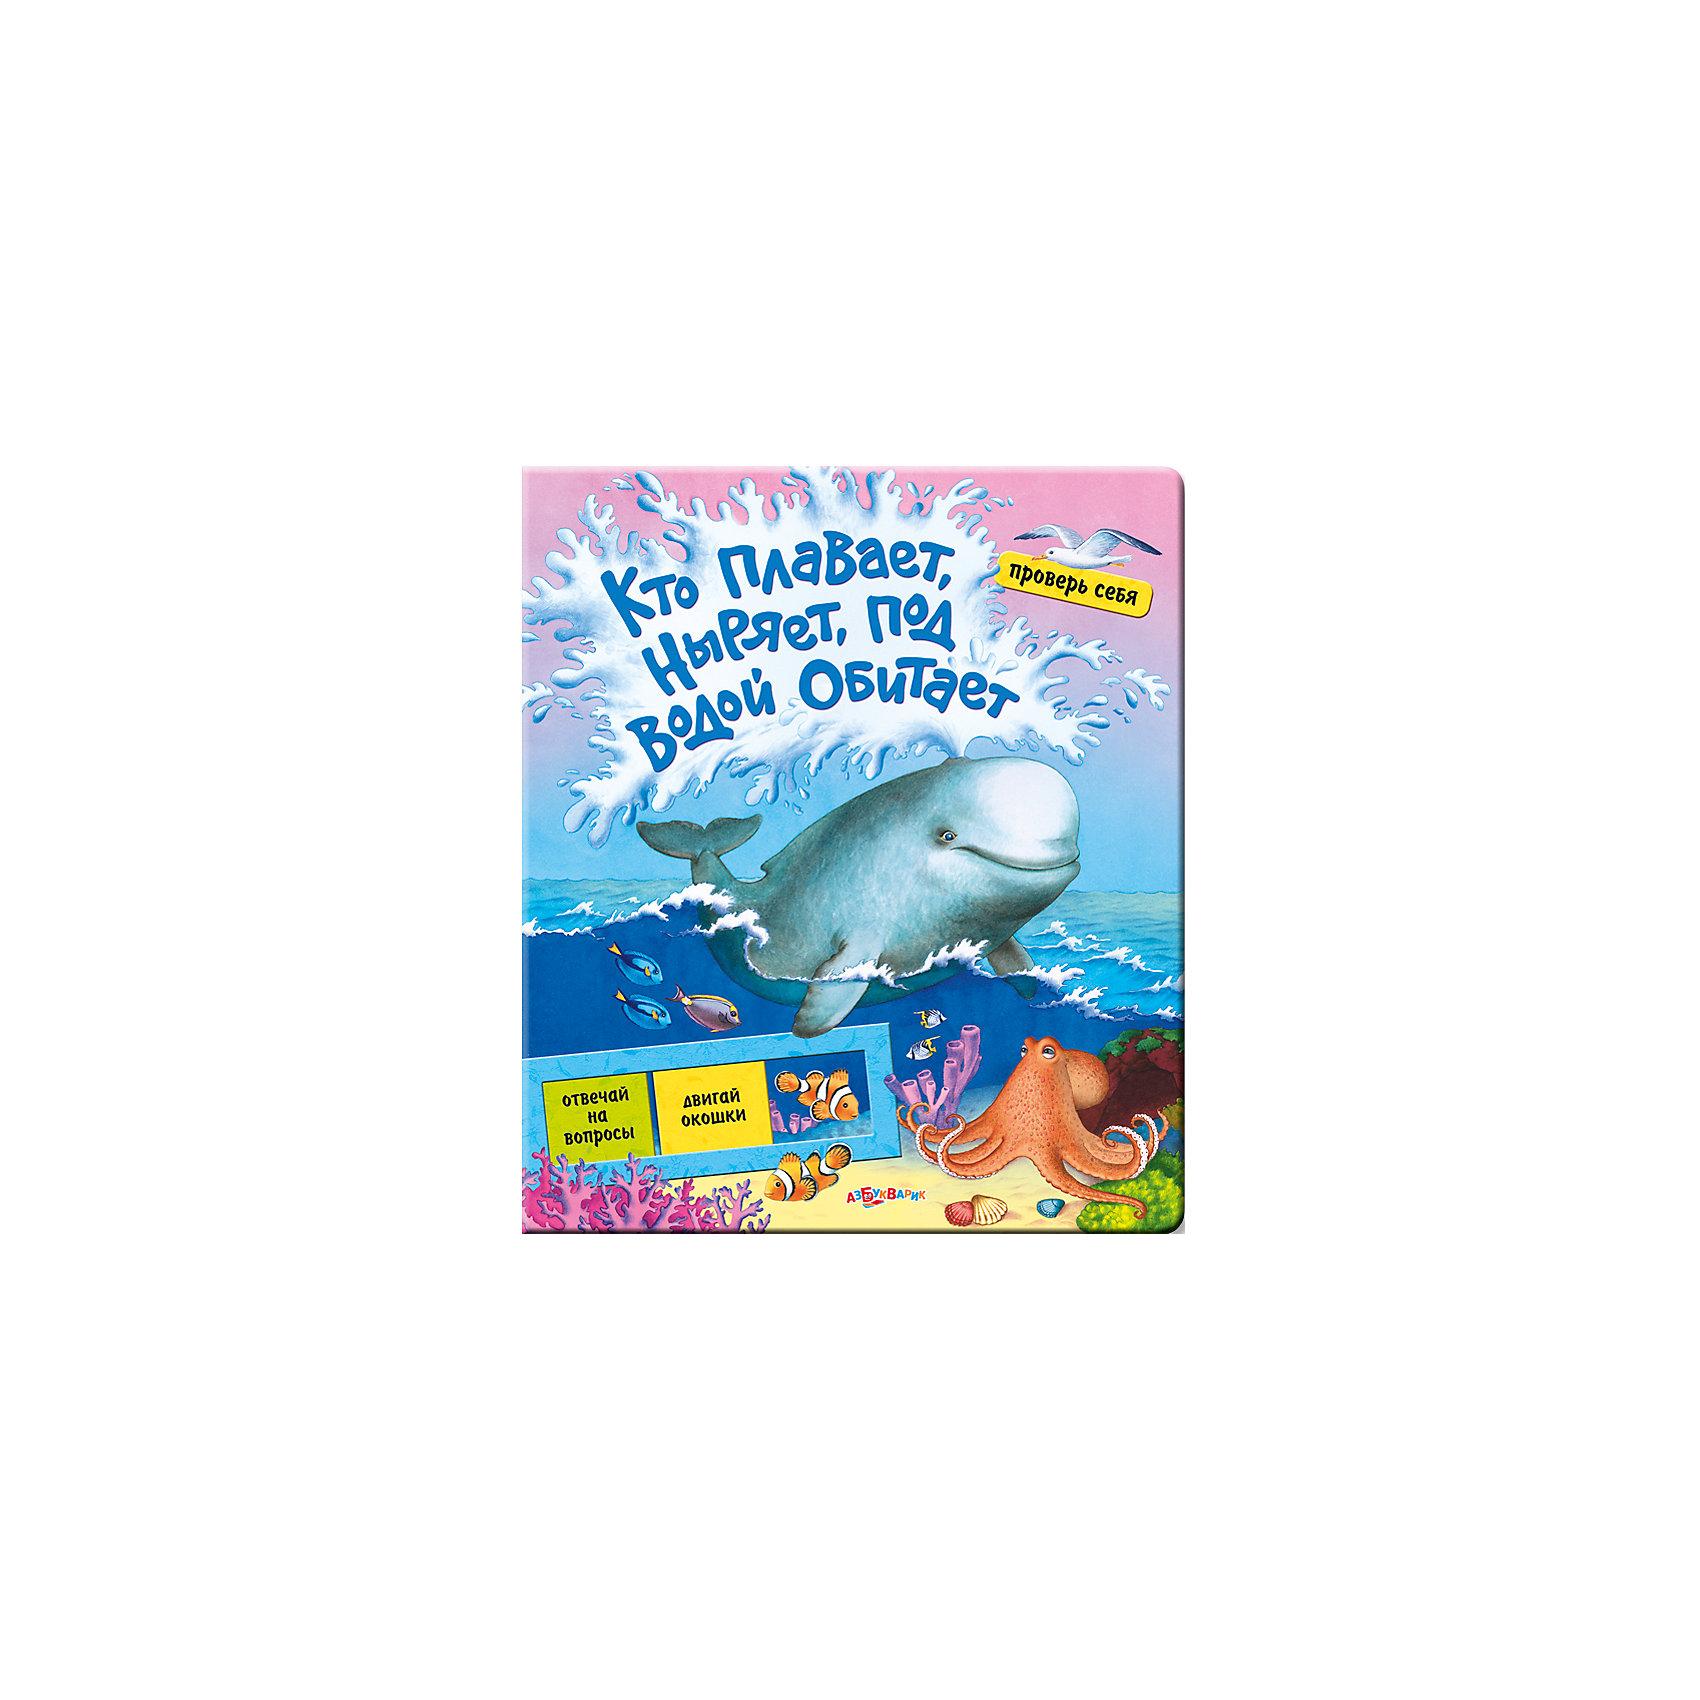 Кто плавает, ныряет, под водой<br><br>Ширина мм: 221<br>Глубина мм: 15<br>Высота мм: 256<br>Вес г: 624<br>Возраст от месяцев: 24<br>Возраст до месяцев: 48<br>Пол: Унисекс<br>Возраст: Детский<br>SKU: 4812073